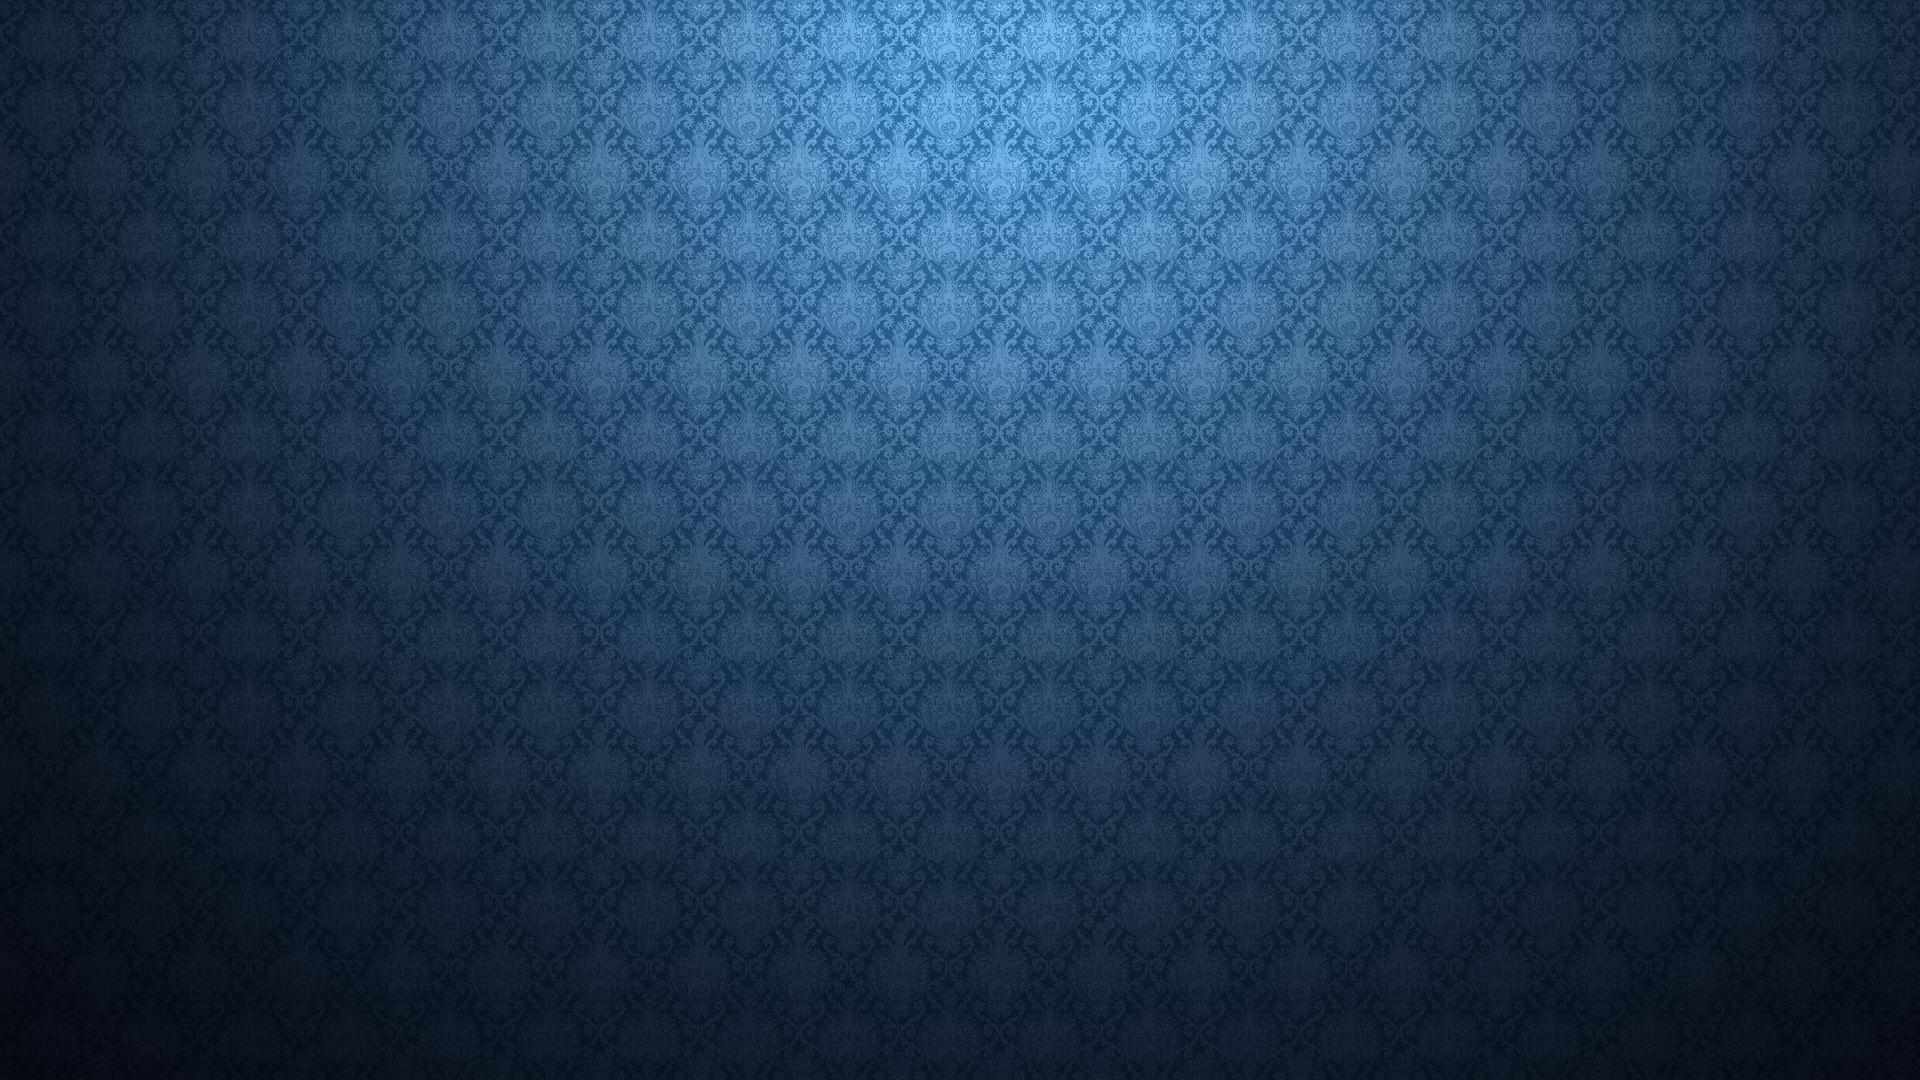 Download Wallpaper 1920x1080 Background, Patterns, Shadows, Bumps ...